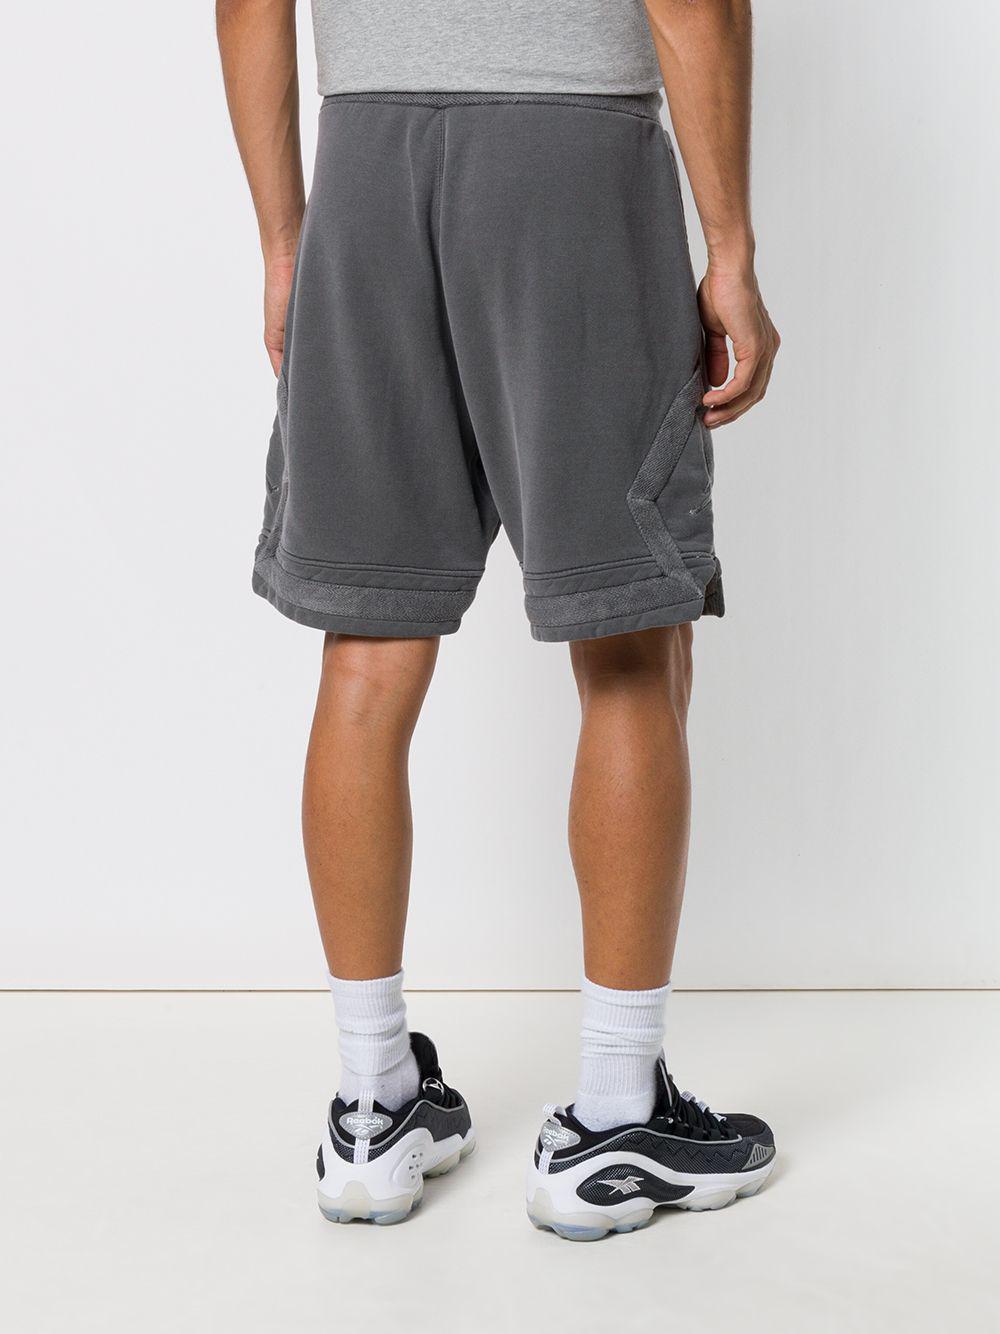 16b4f4da8a Nike Jordan Sportswear Diamond Washed Fleece Shorts in Gray for Men ...